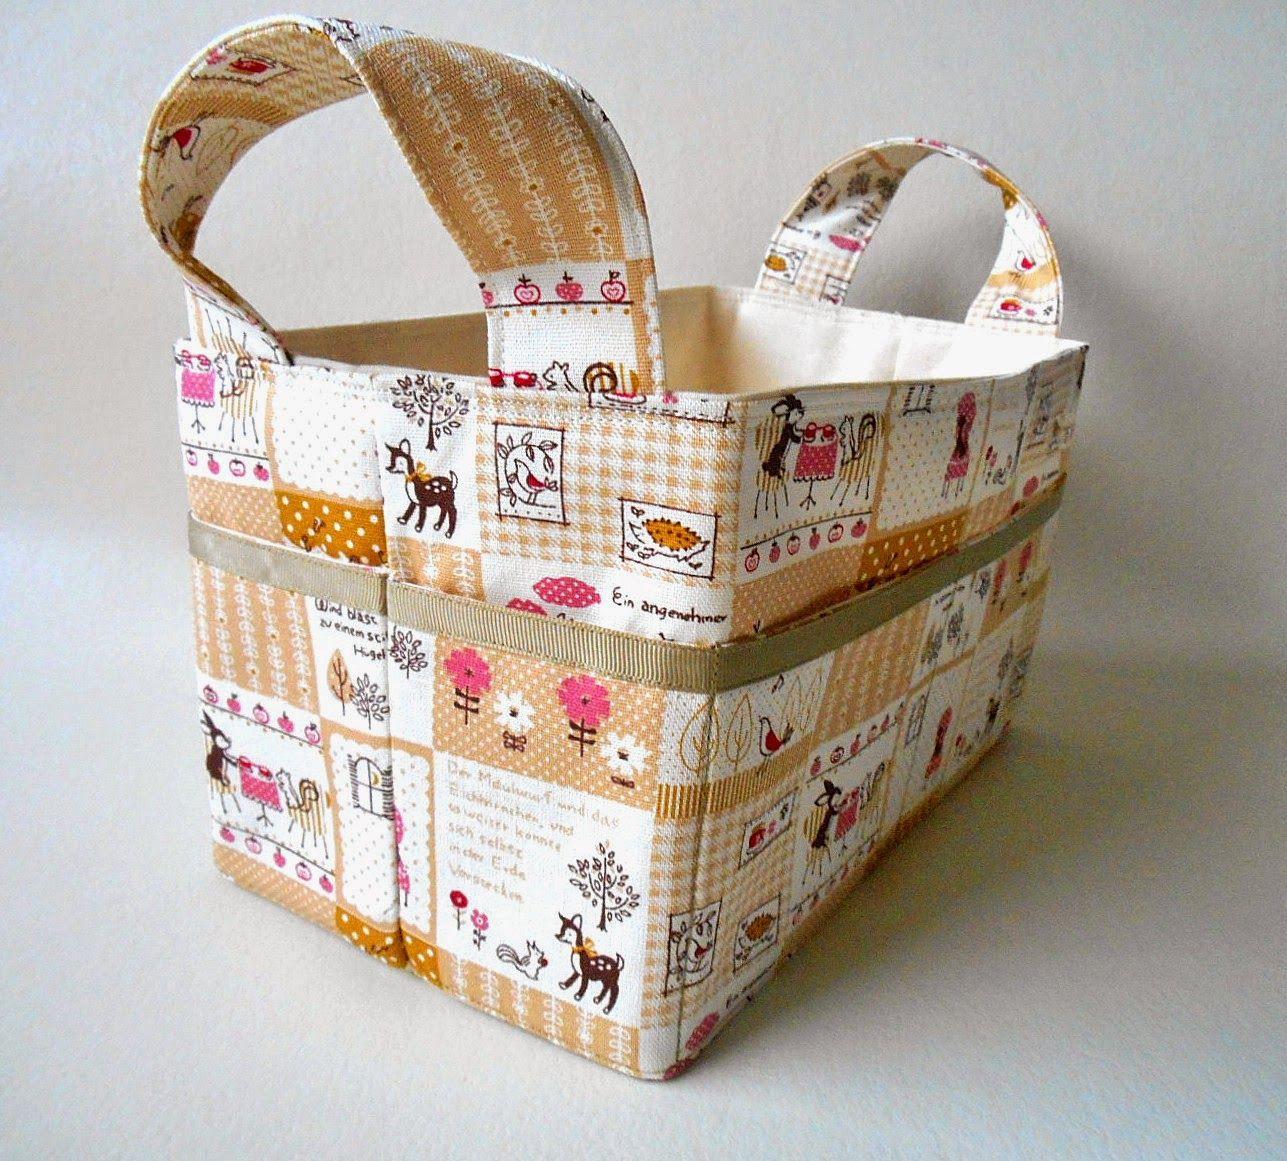 handmade by eva rose: Forest Animal Friends for Tea